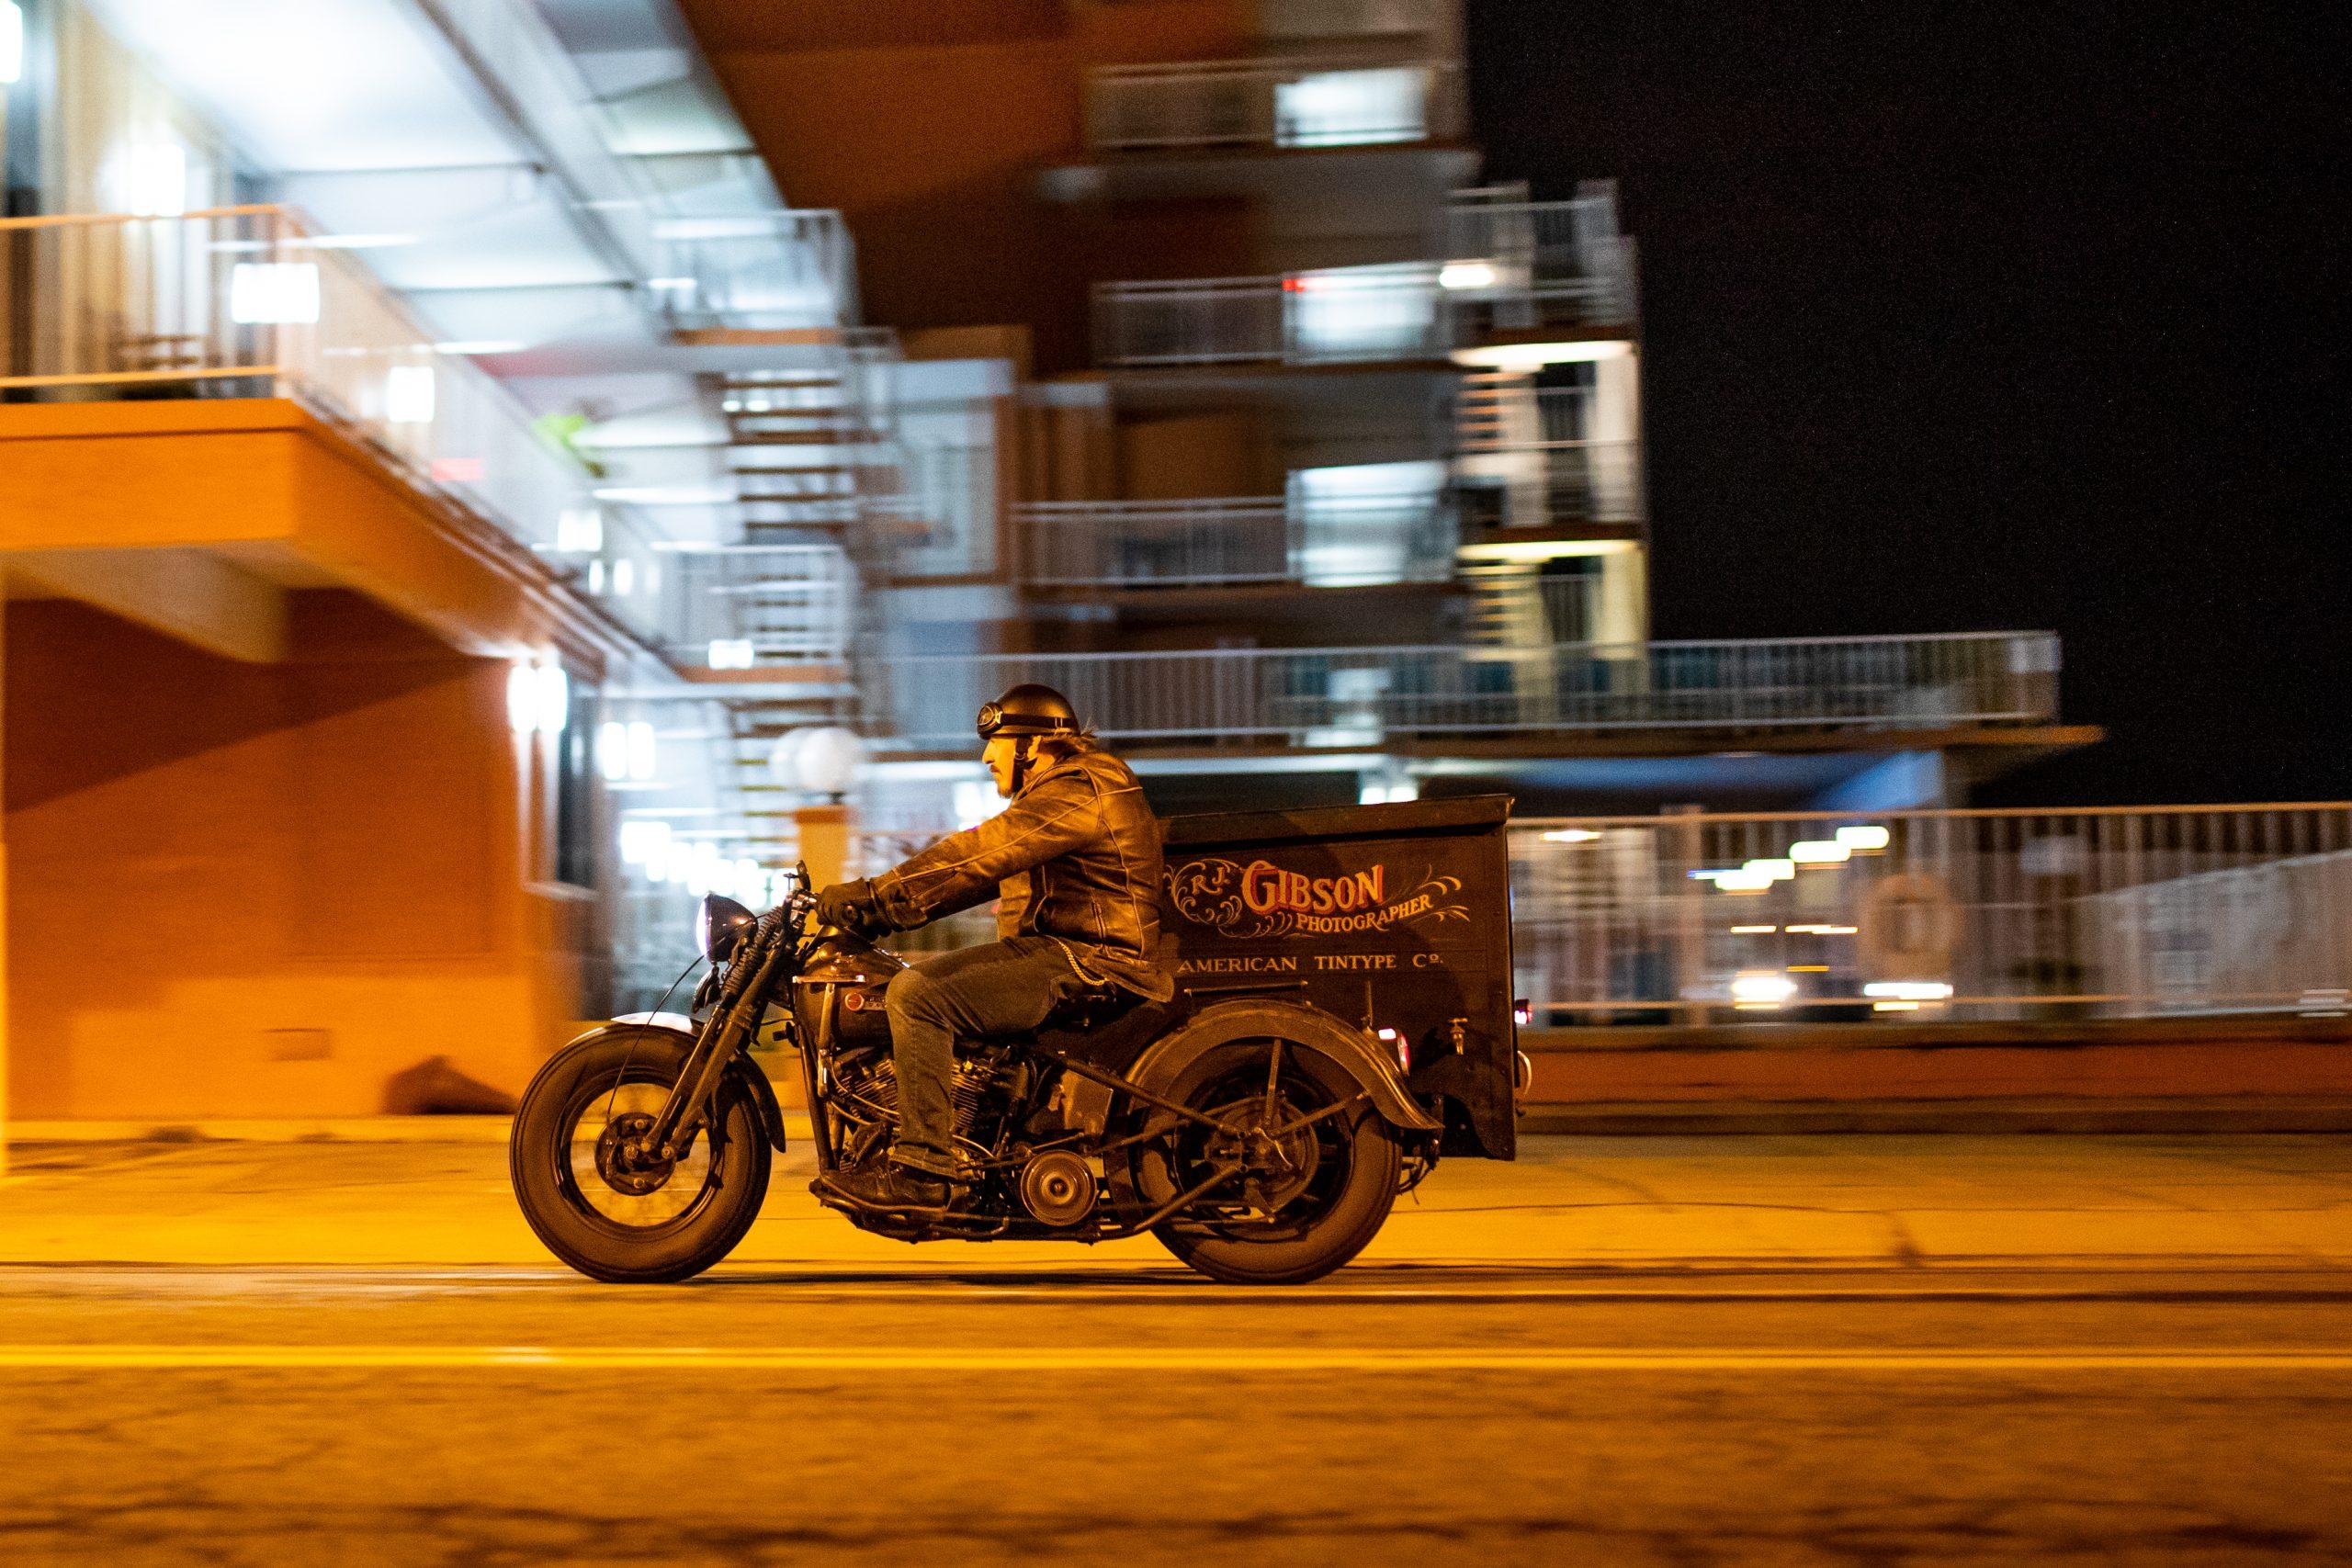 gibson motorbike street action